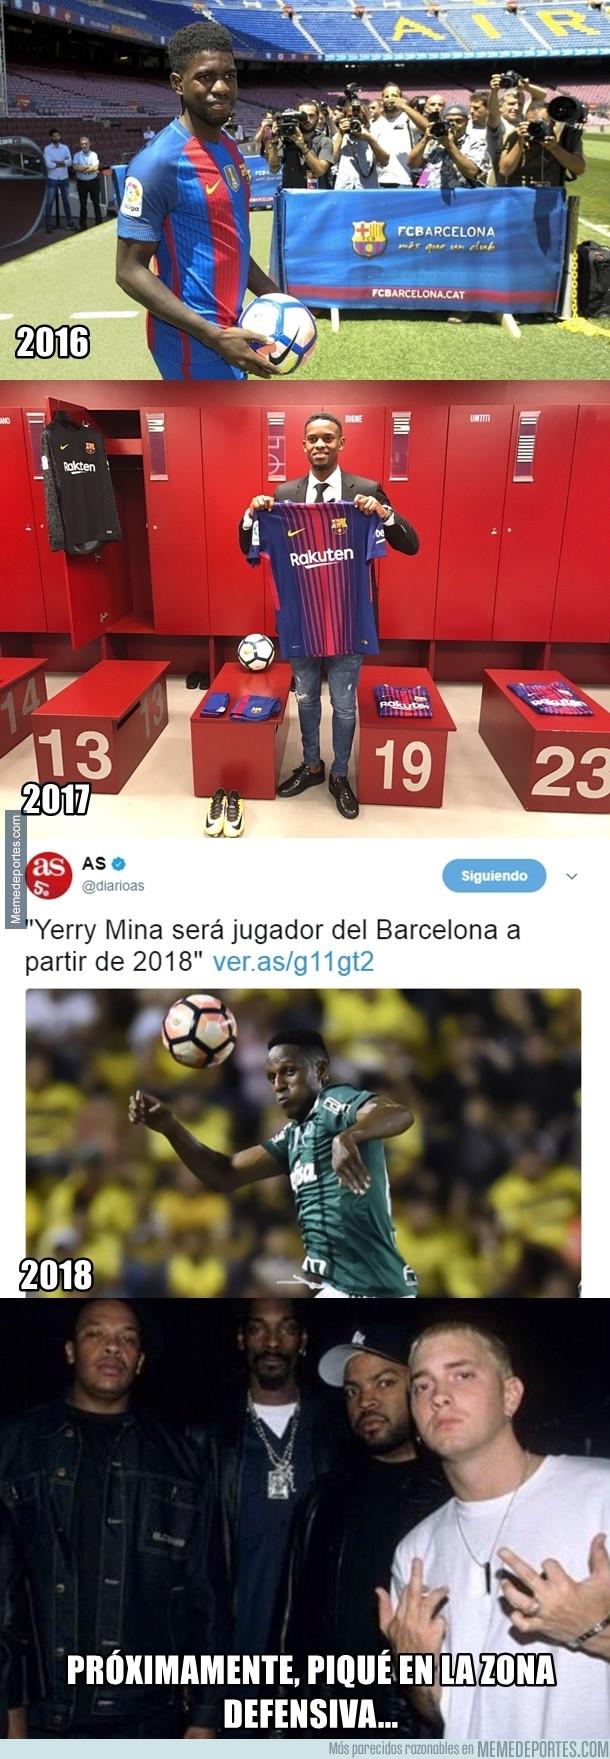 988109 - La defensa del Barça comienza a parecerse a una cárcel